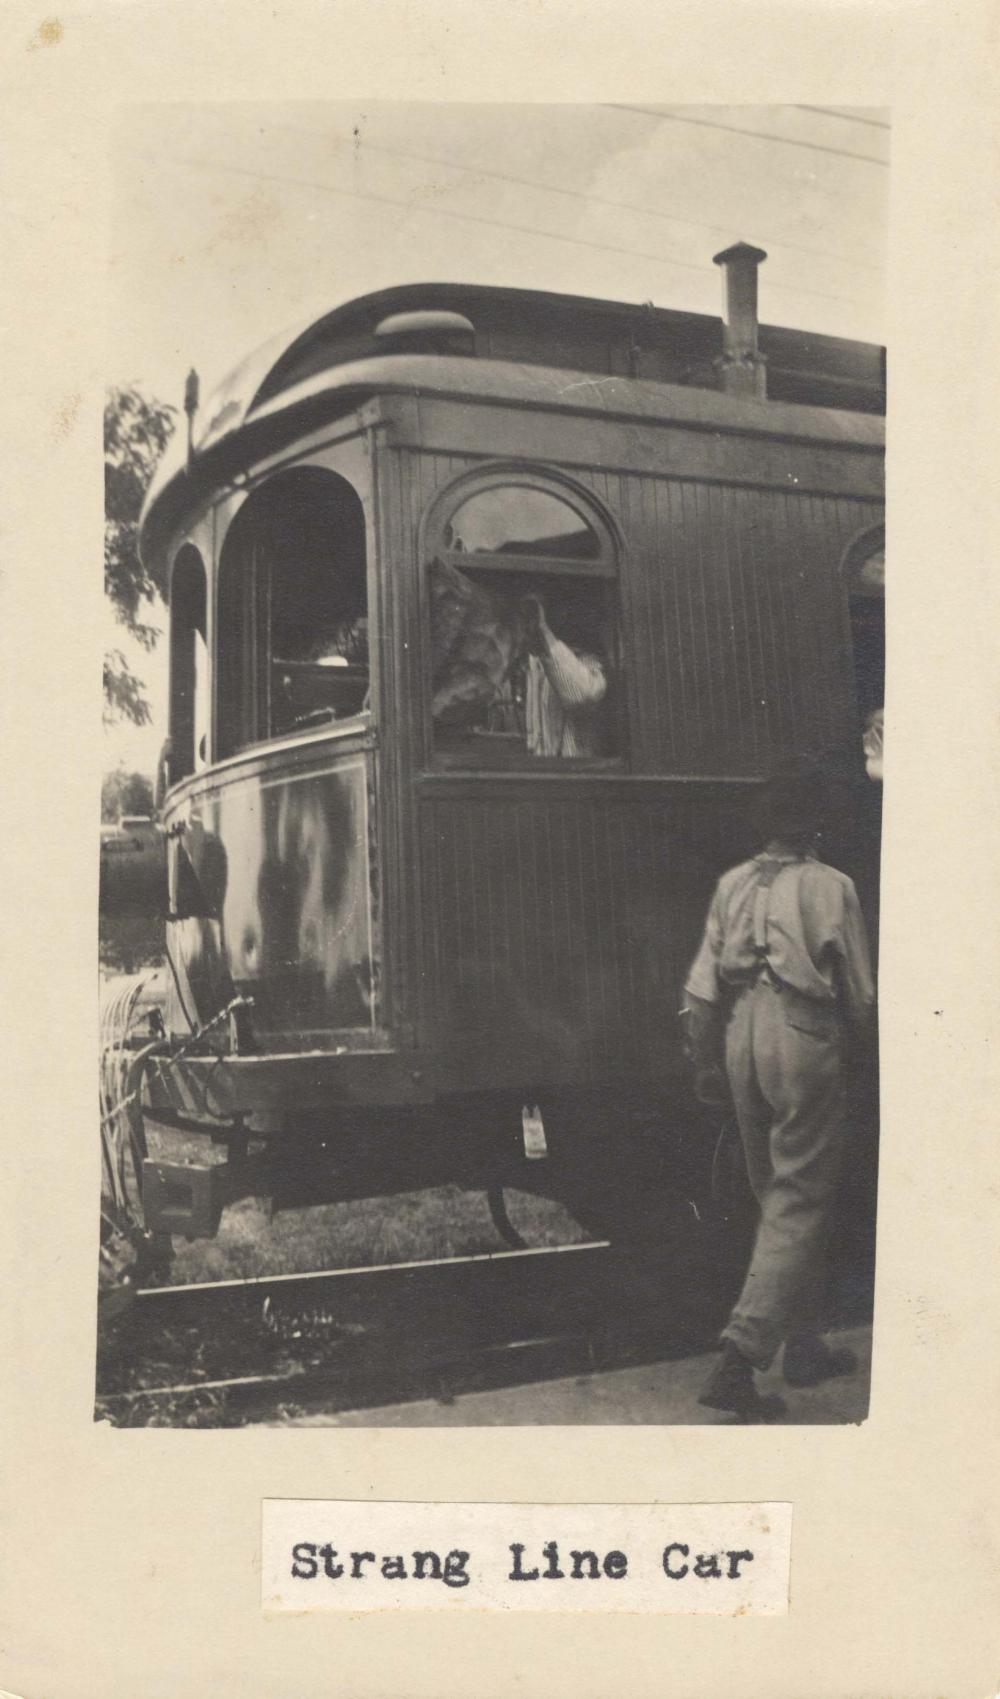 Strang Line Car